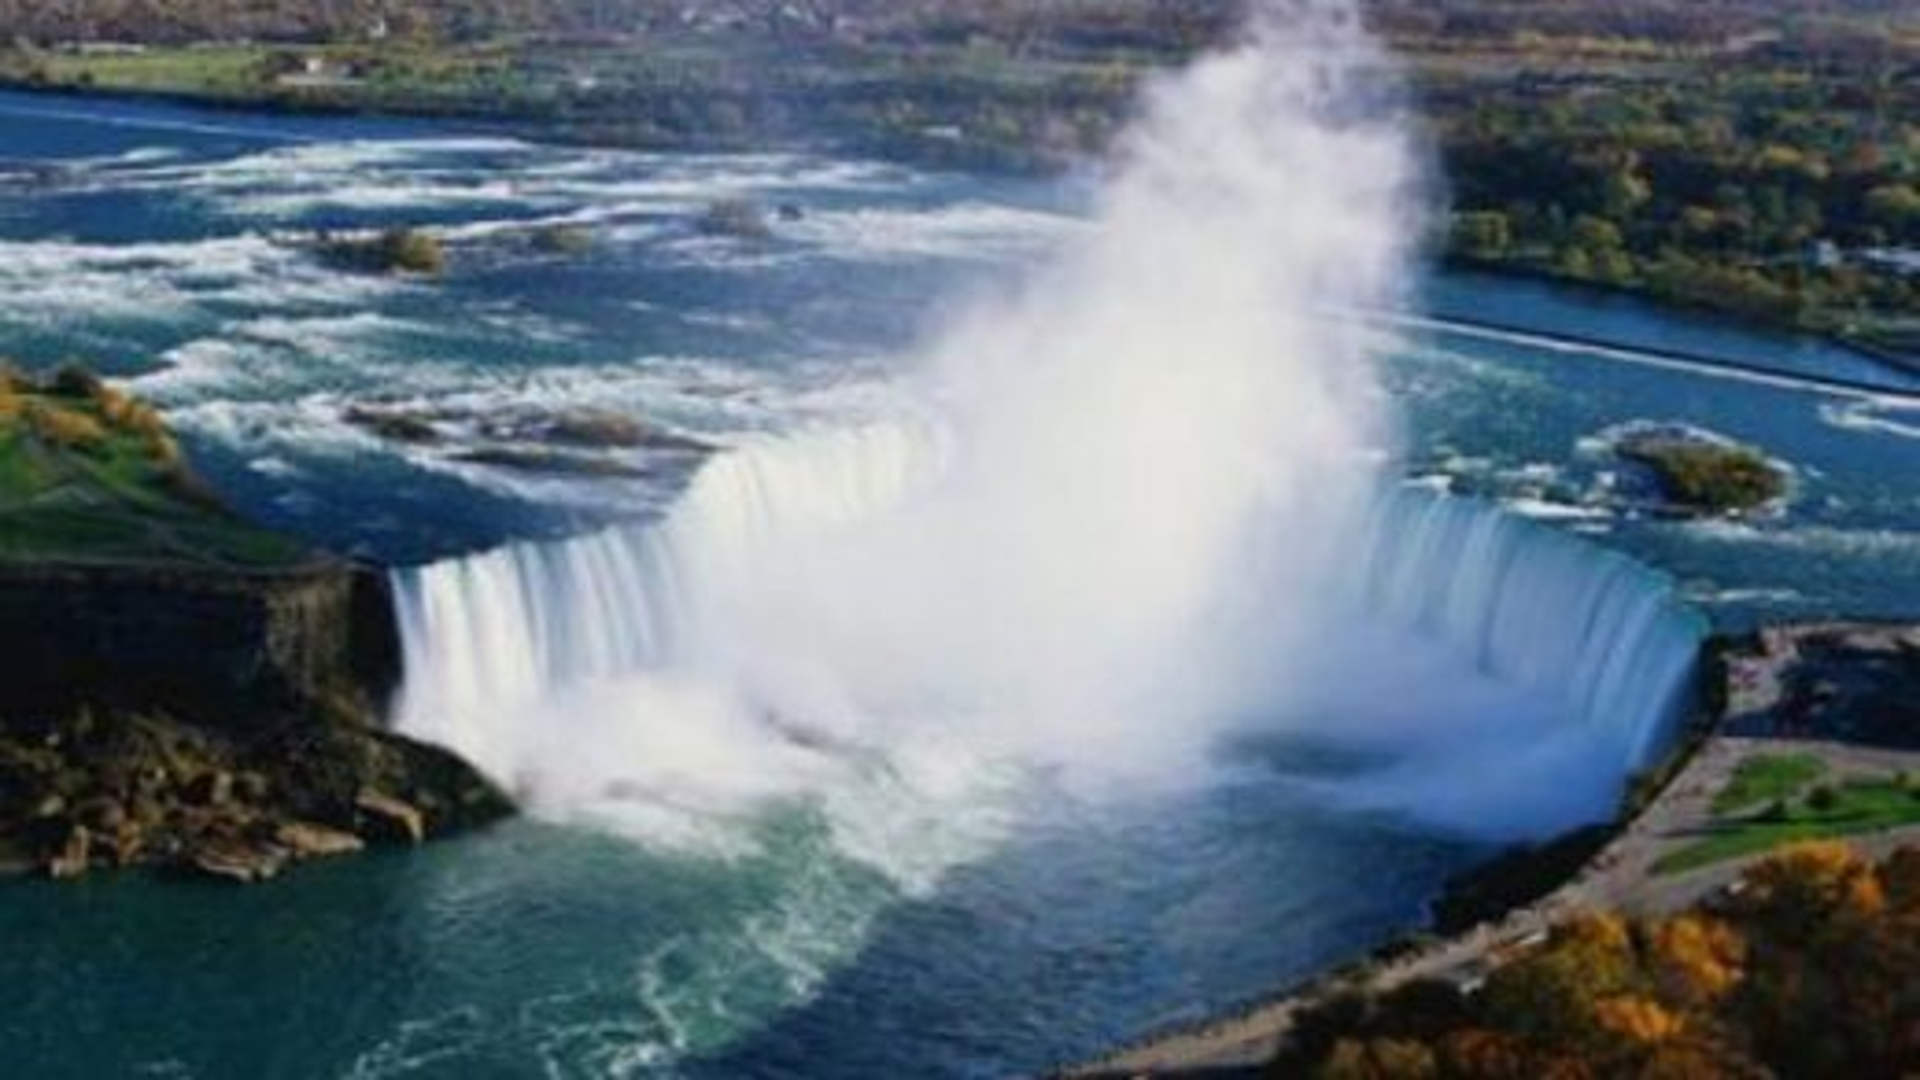 رودخانه آمازون | ت